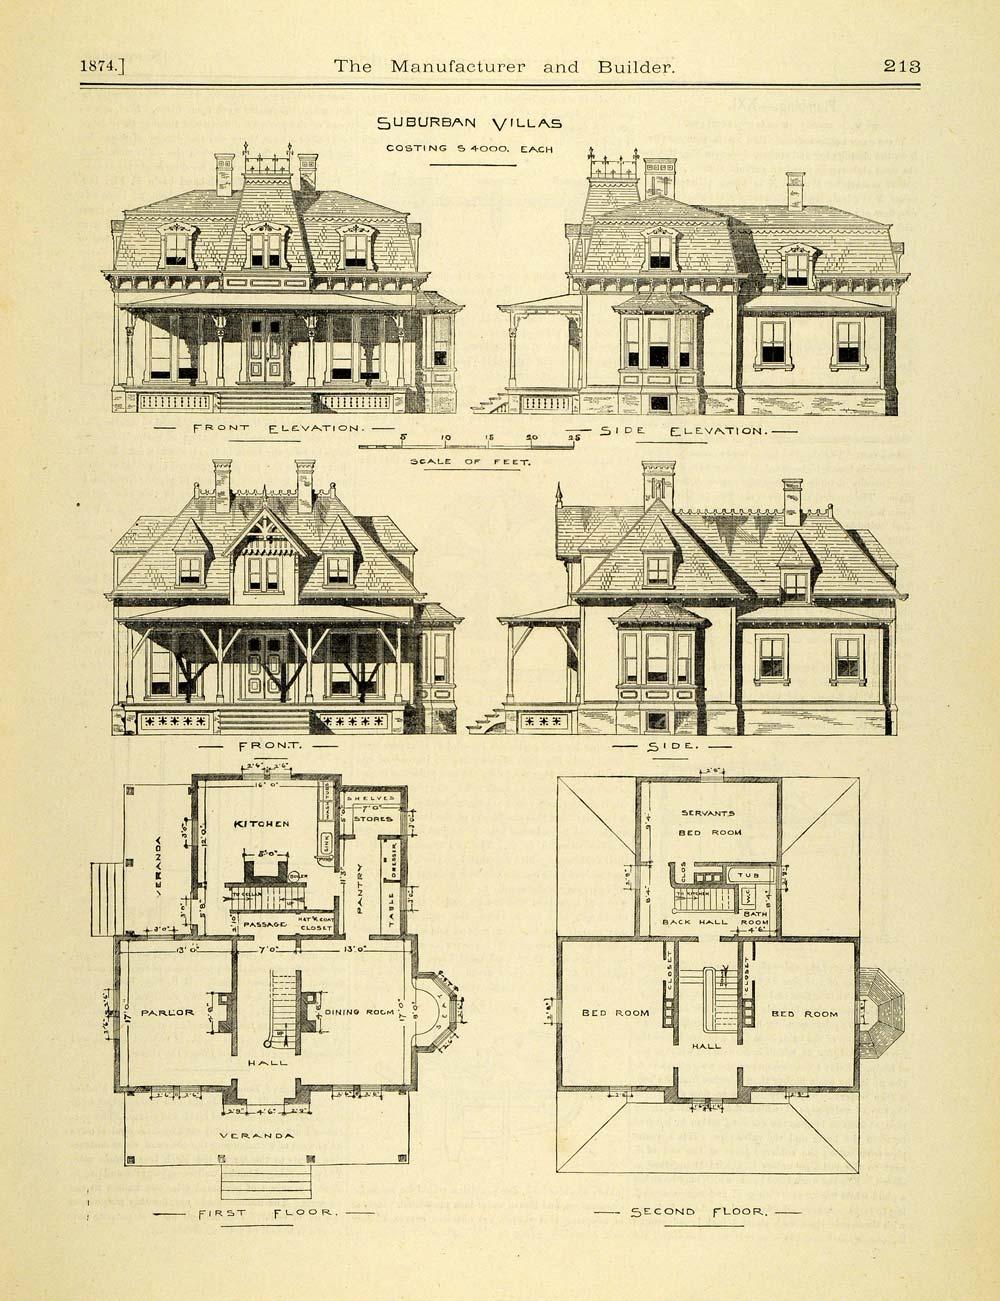 Suburban house plans 28 images suburban house plans for Suburban house plans